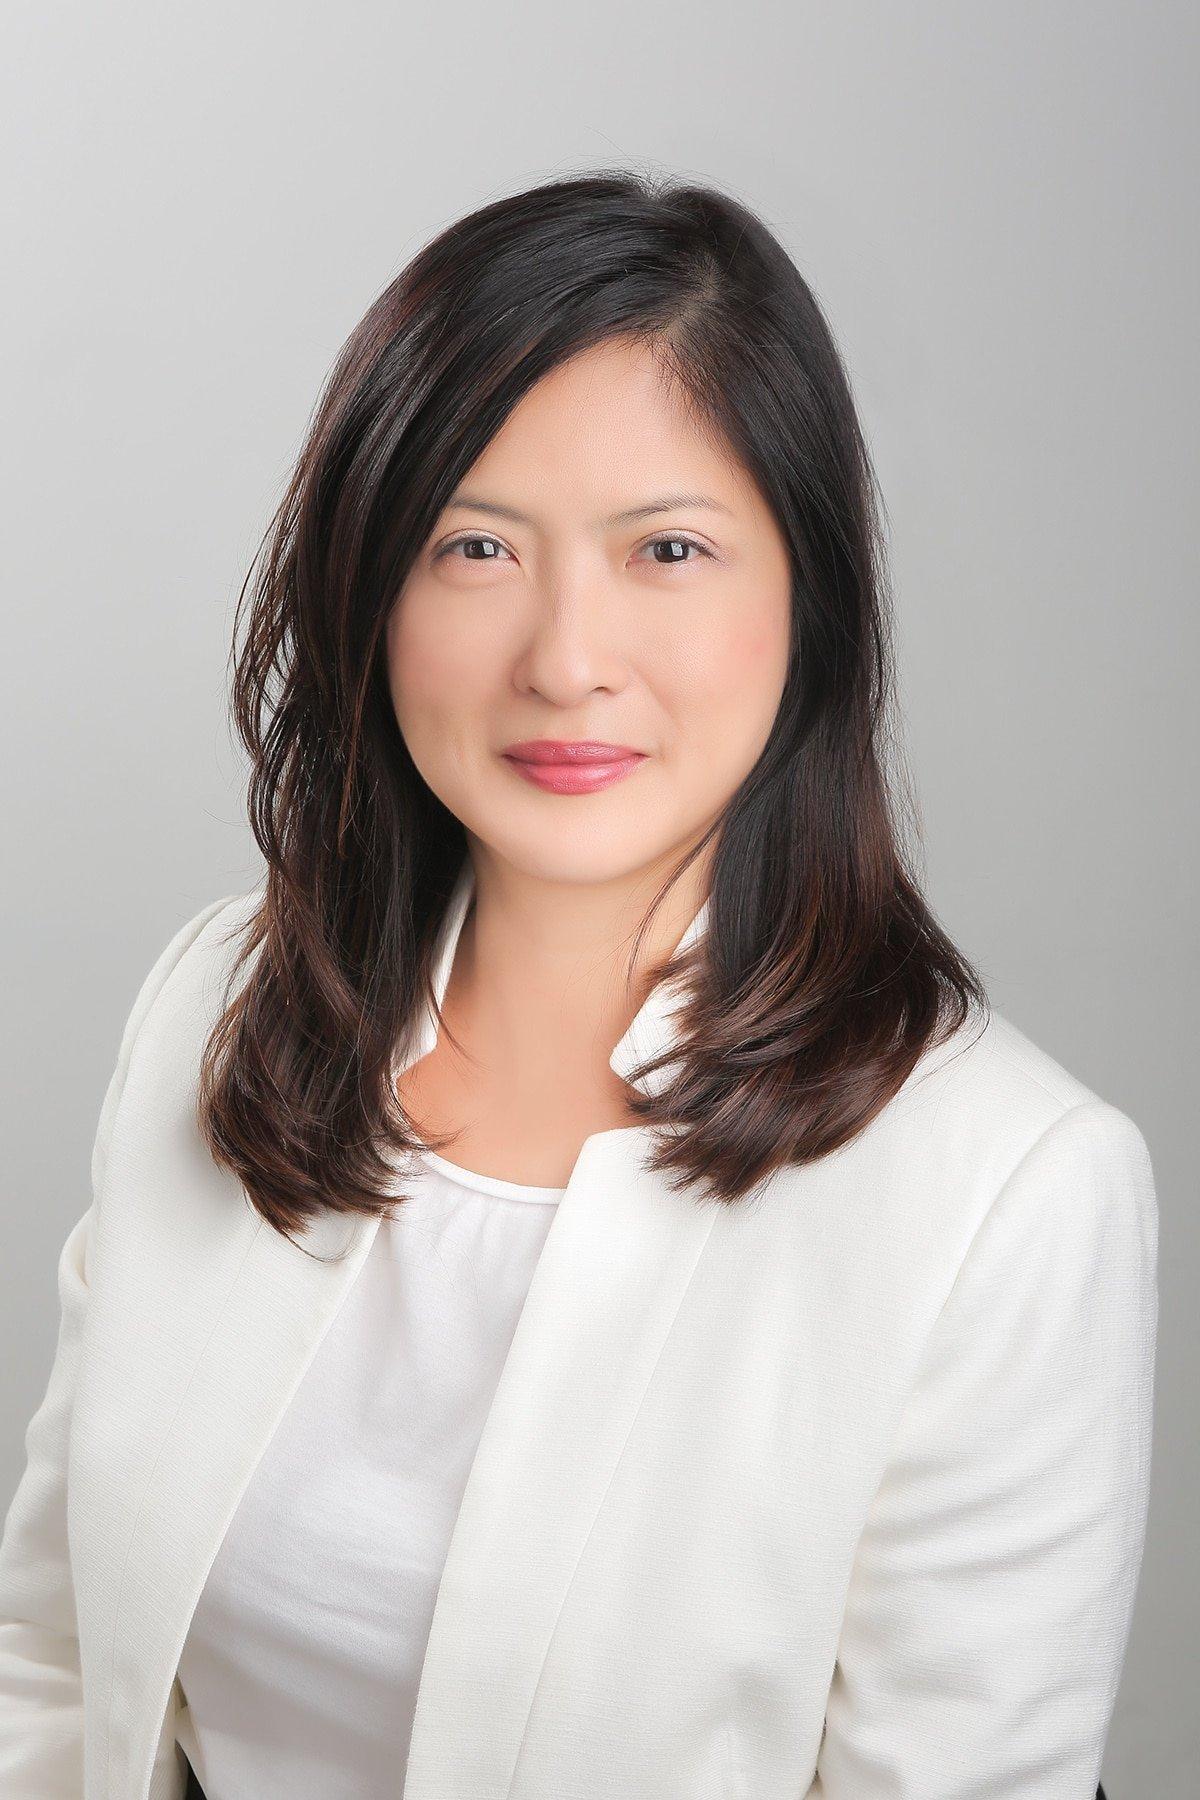 Oi Yee Choo - CCO iSTOX